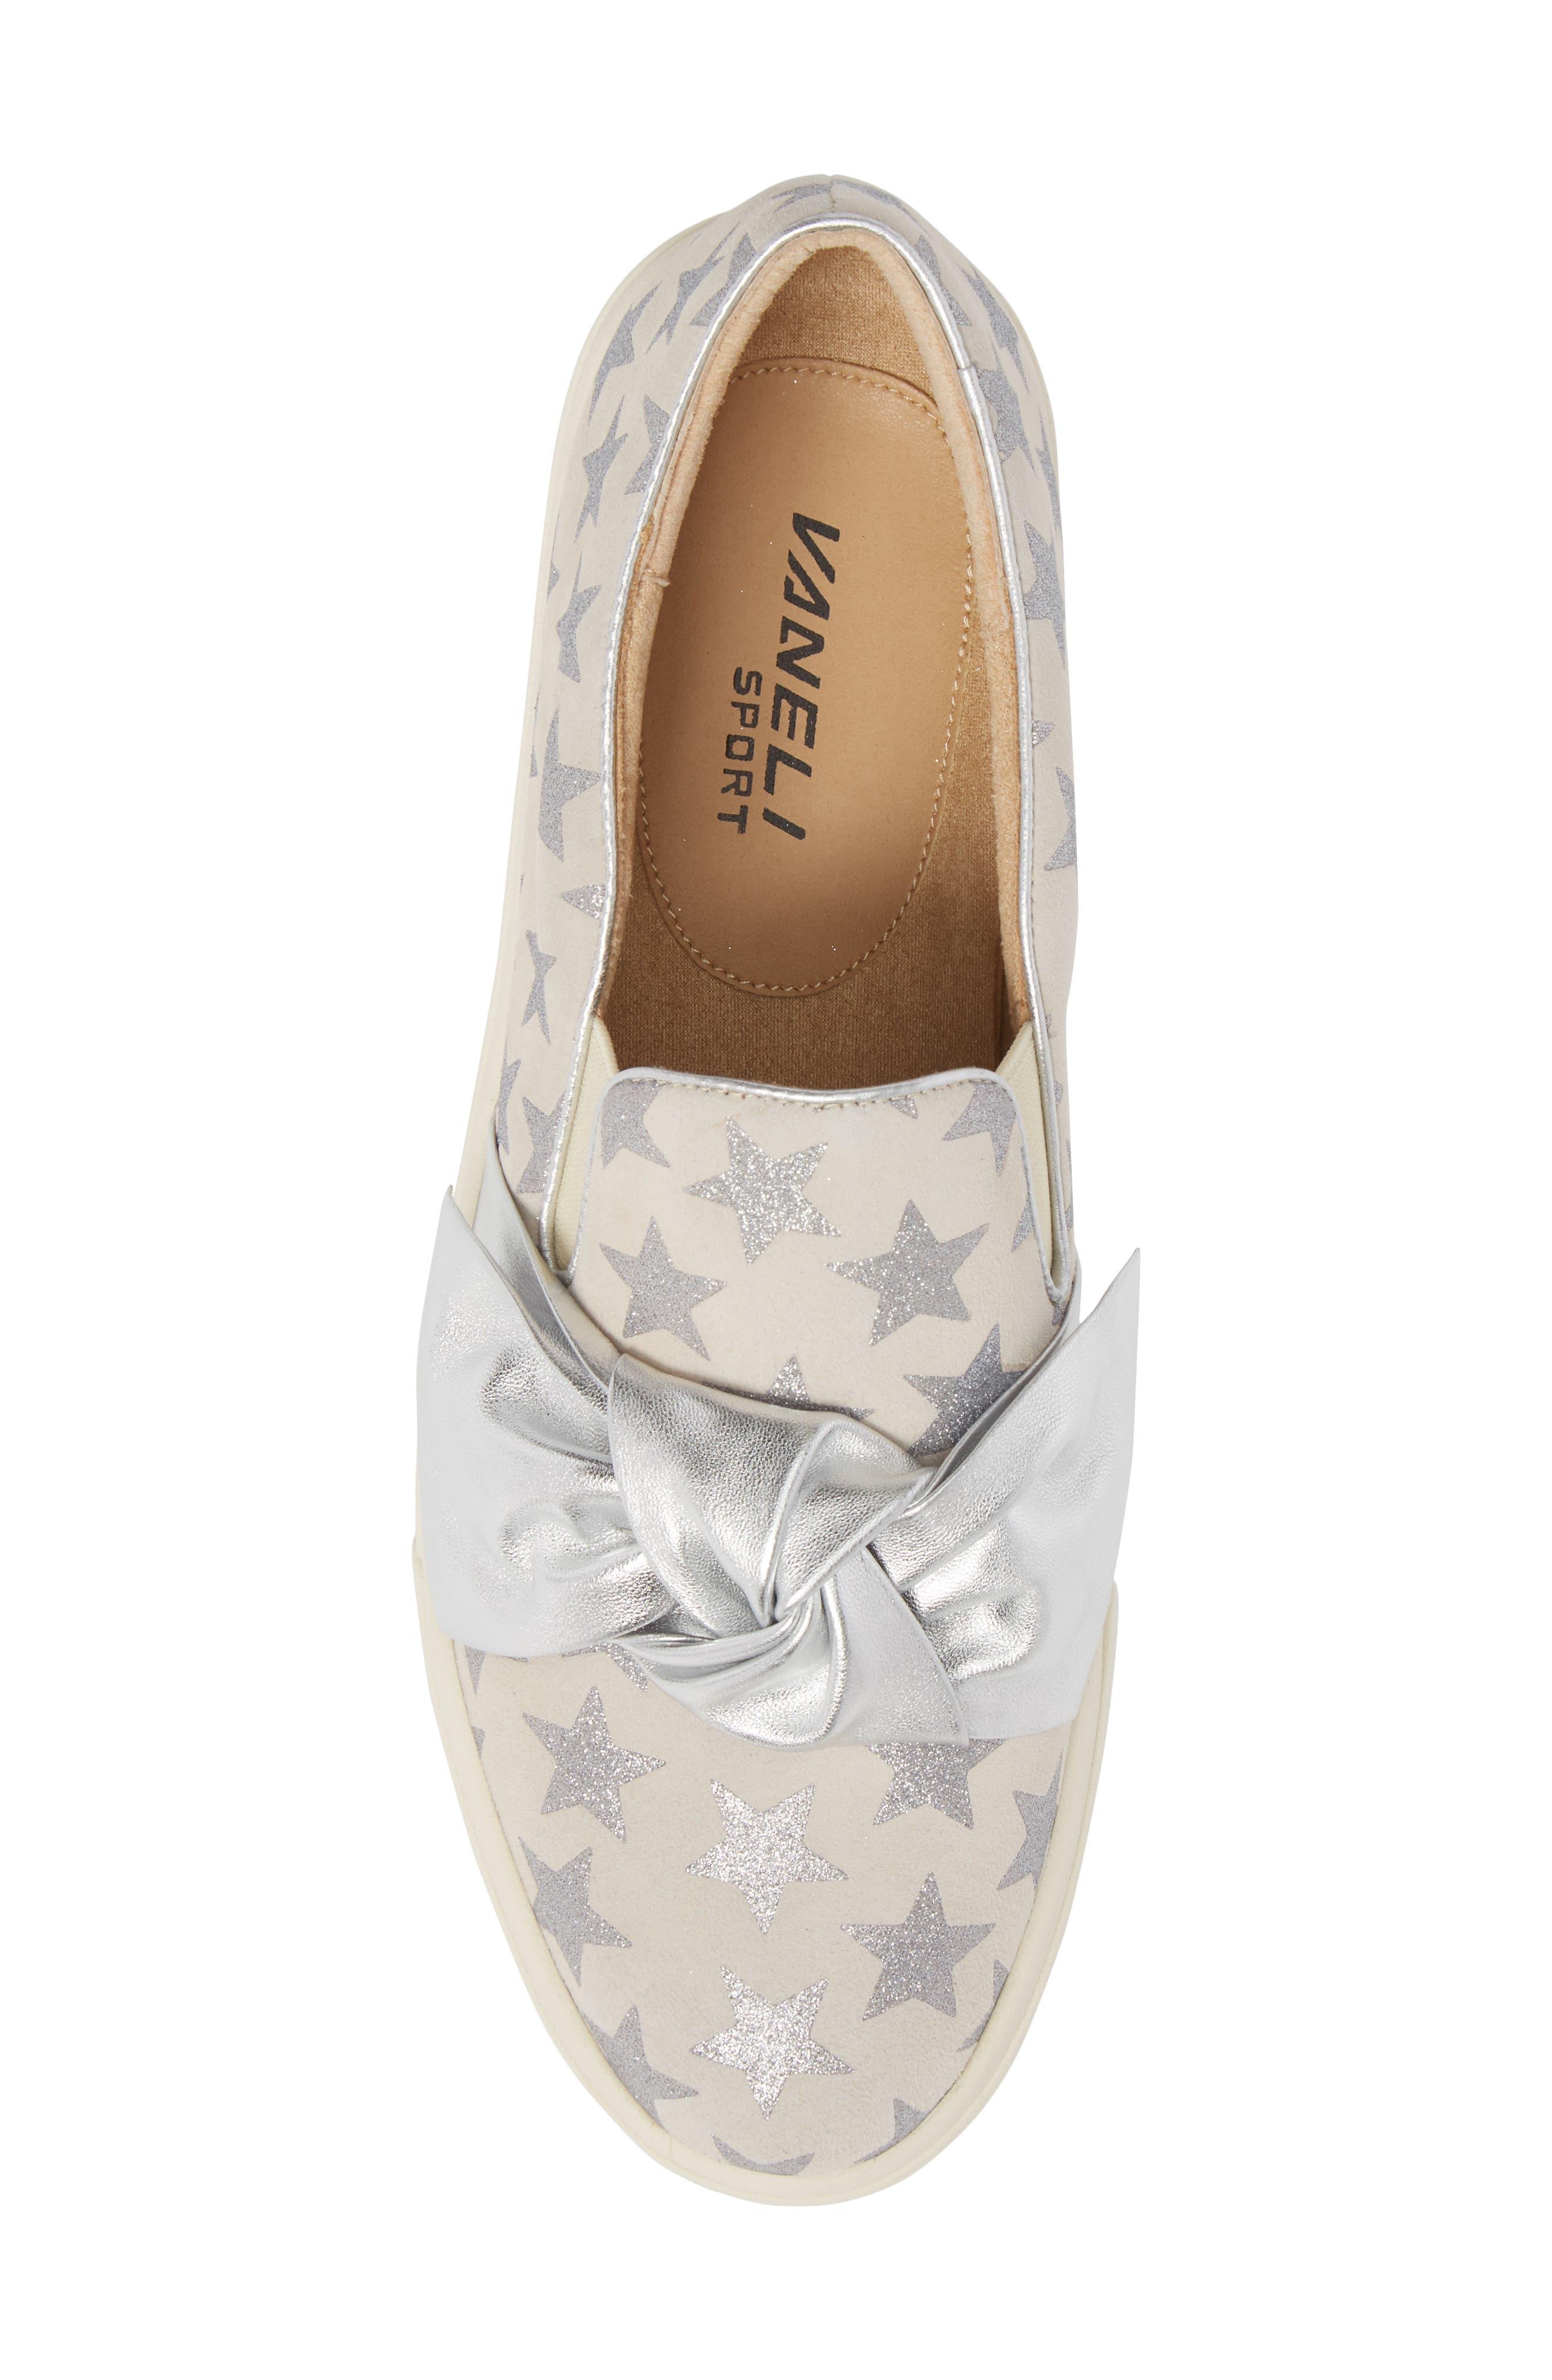 Odelet Slip-On Sneaker,                             Alternate thumbnail 5, color,                             Beige/ Silver Suede